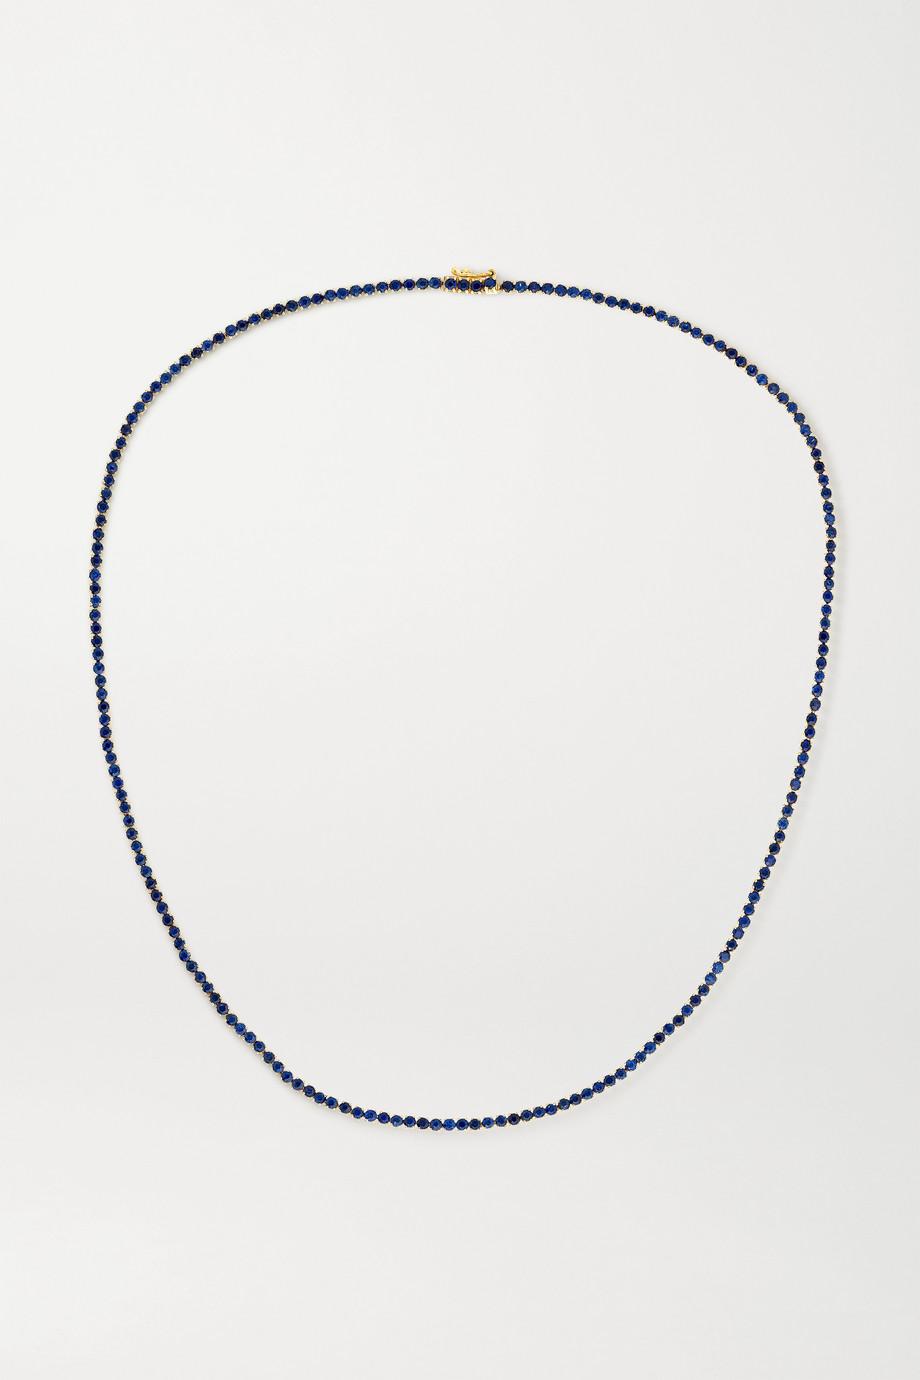 Anita Ko Hepburn 18-karat gold sapphire choker